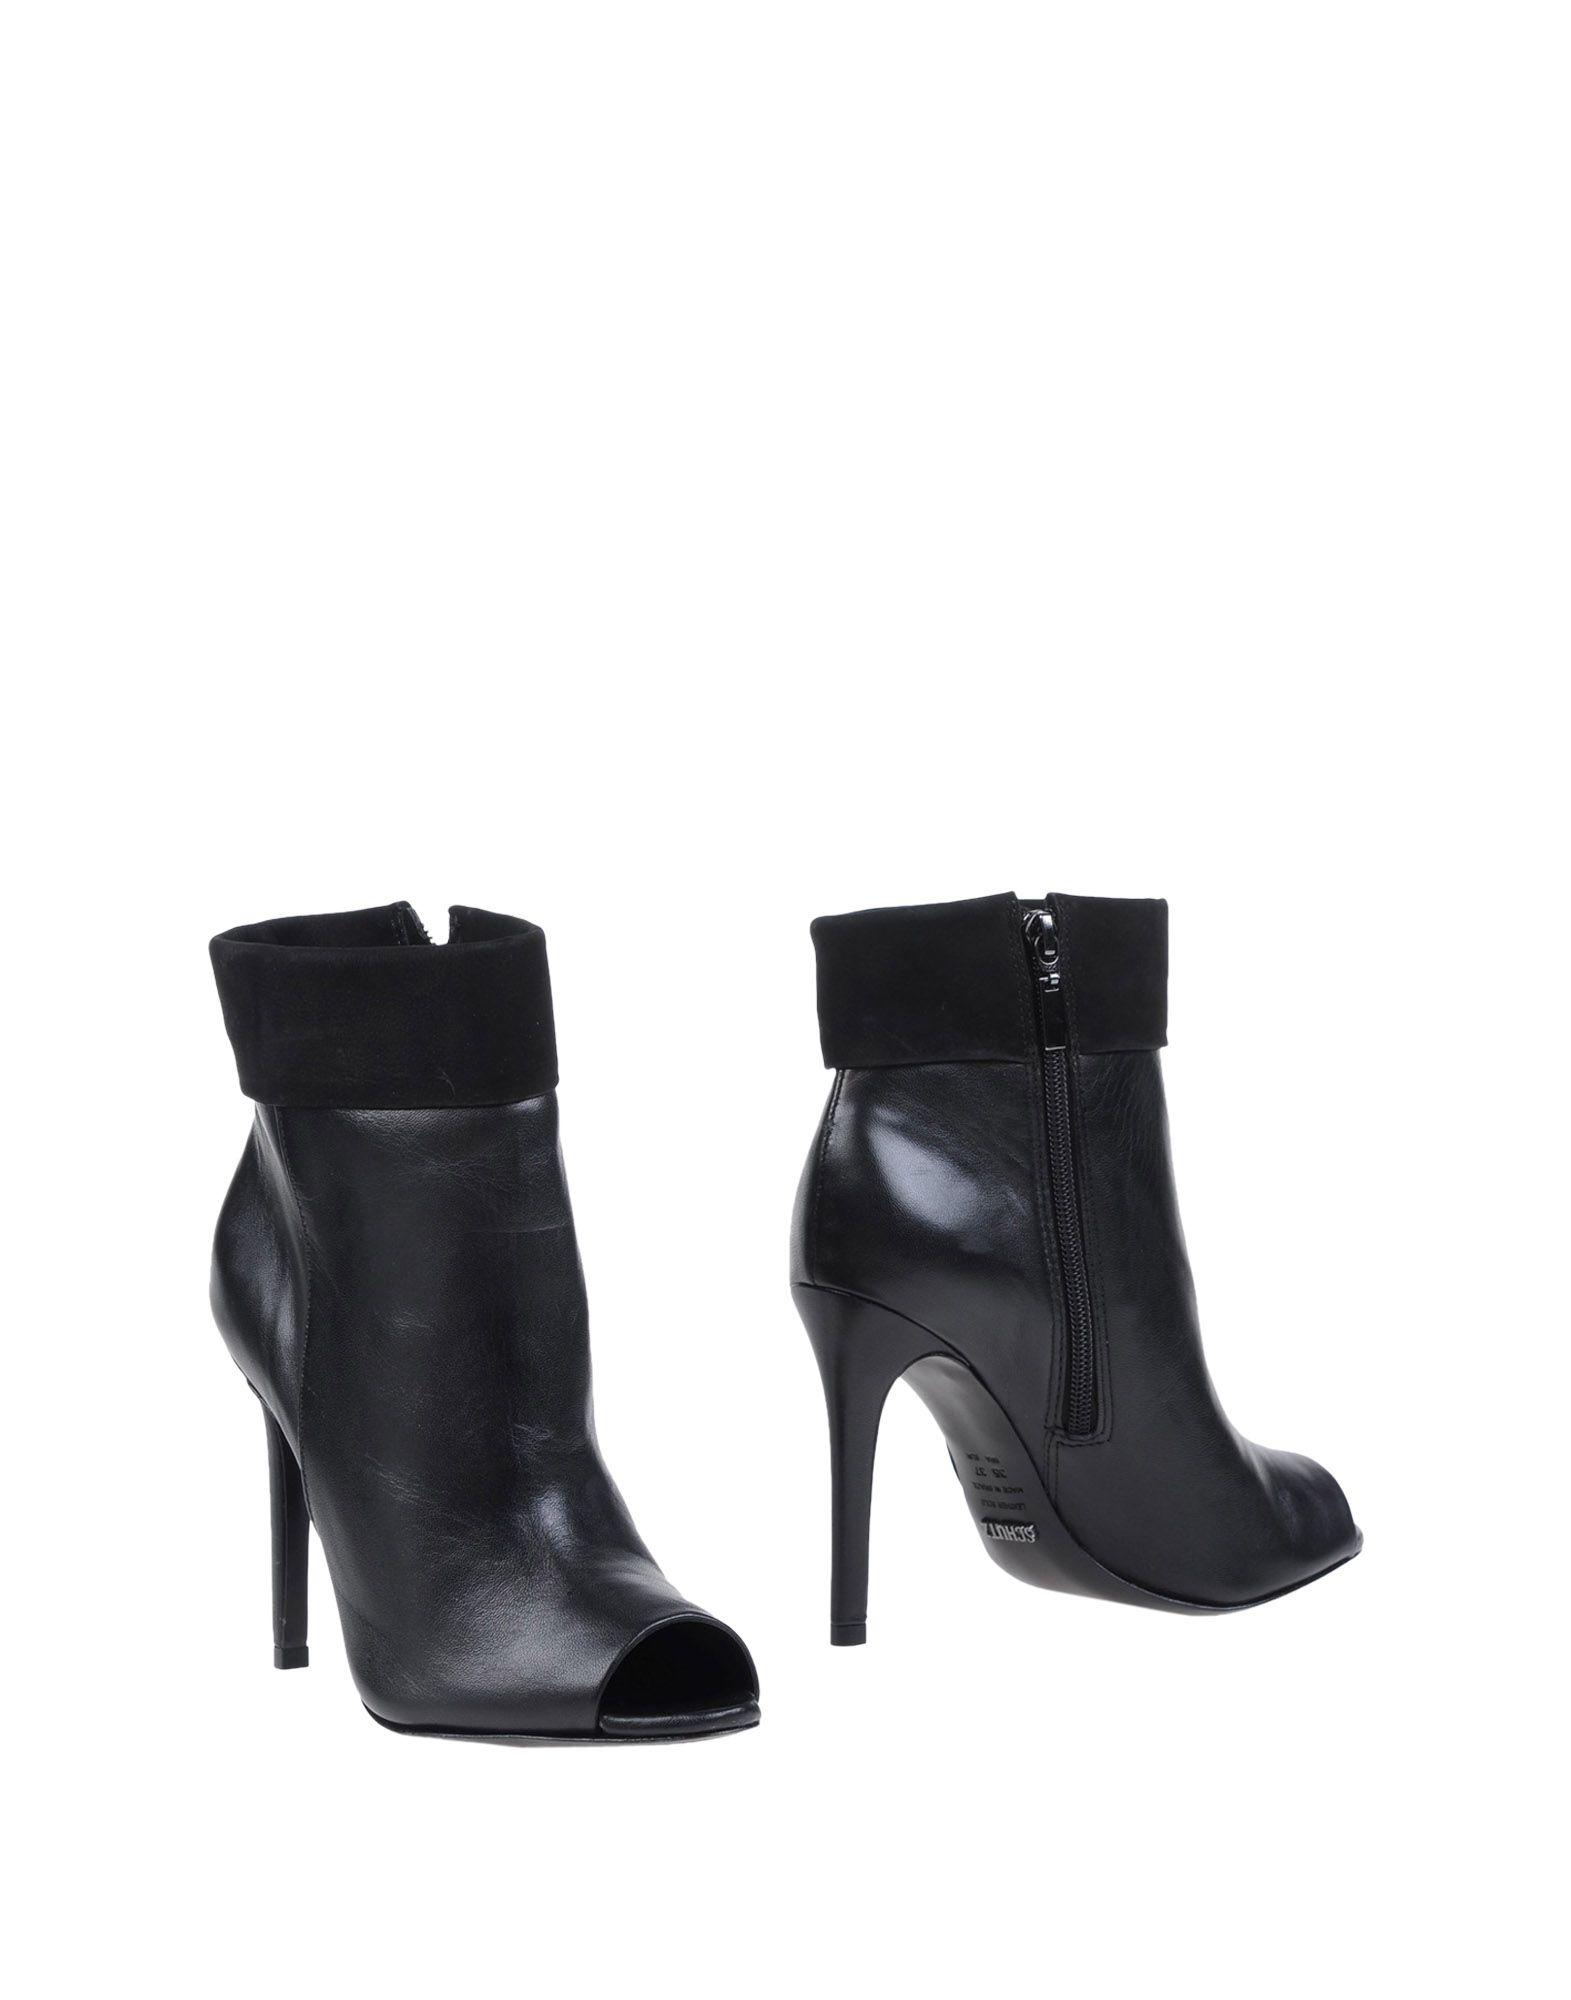 Schutz Ankle Boot - Women Schutz Ankle Australia Boots online on  Australia Ankle - 11025139VH ea9c08